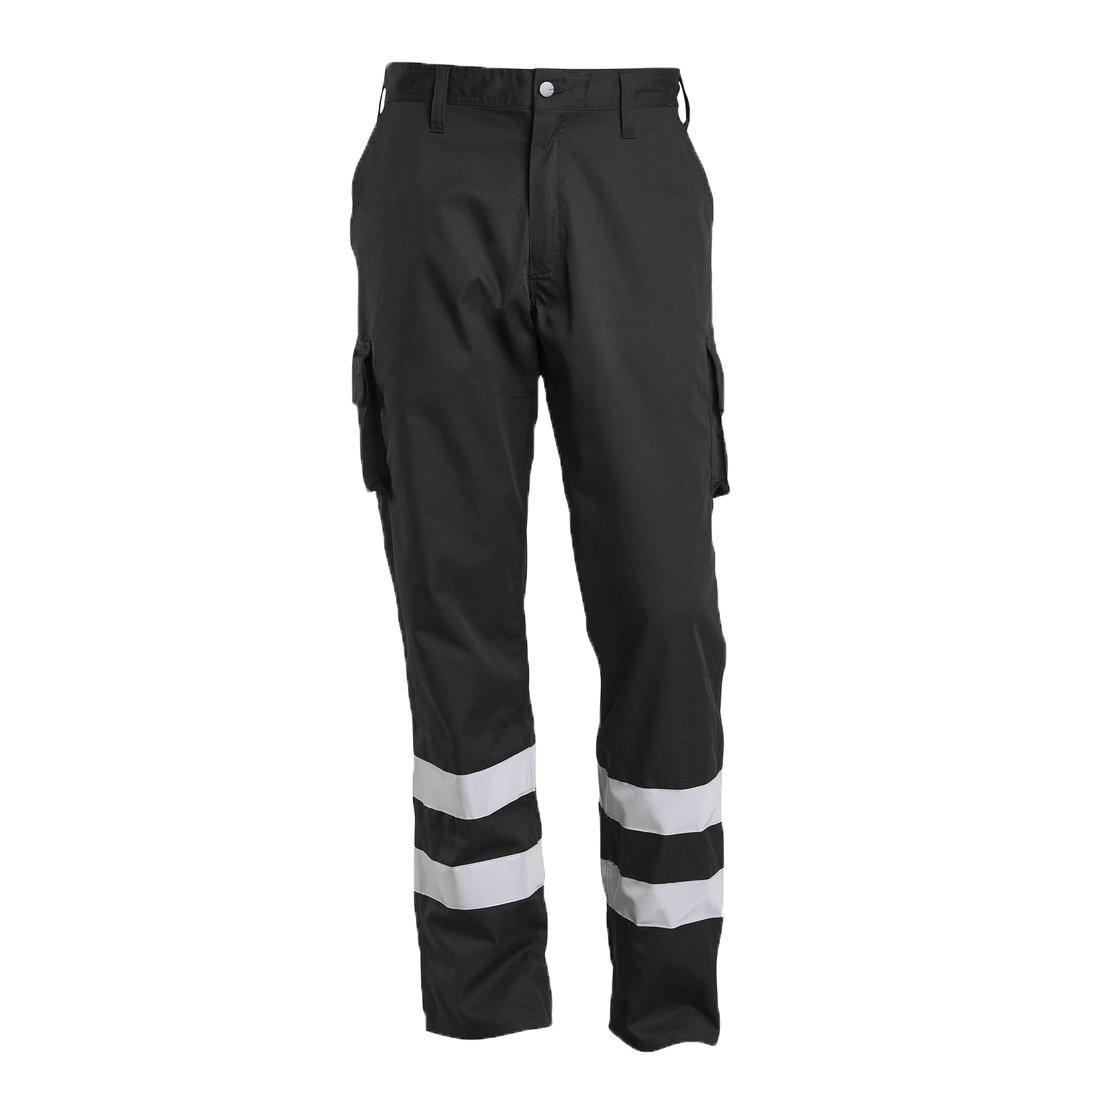 Mascot 17979-850-09-82C46 Service Trousers Safety Pants, Black, 82C46